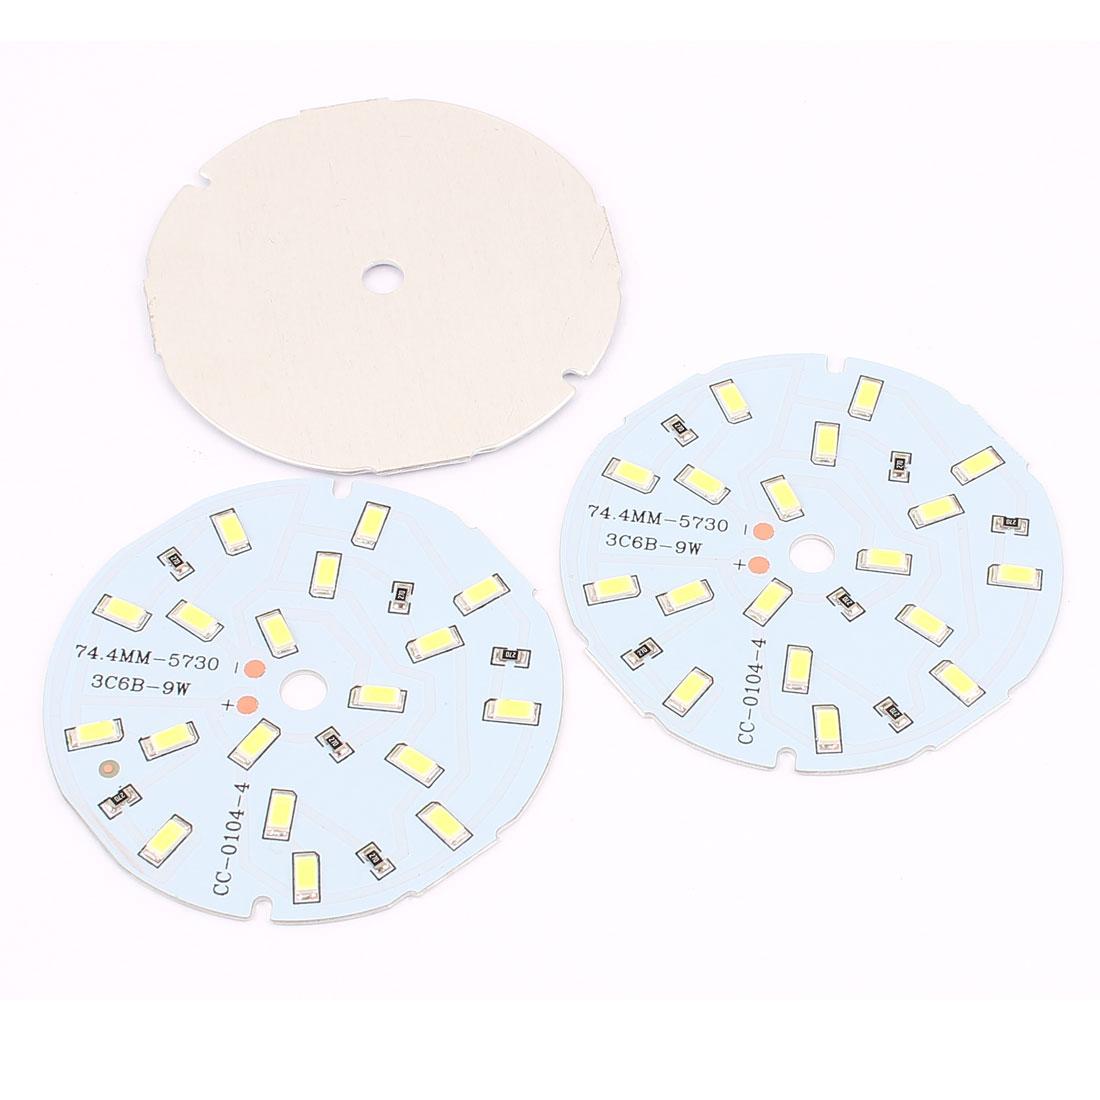 3 Pcs 9W Pure White 18 SMD 5730 LED Light Downlight Aluminum Base Plate